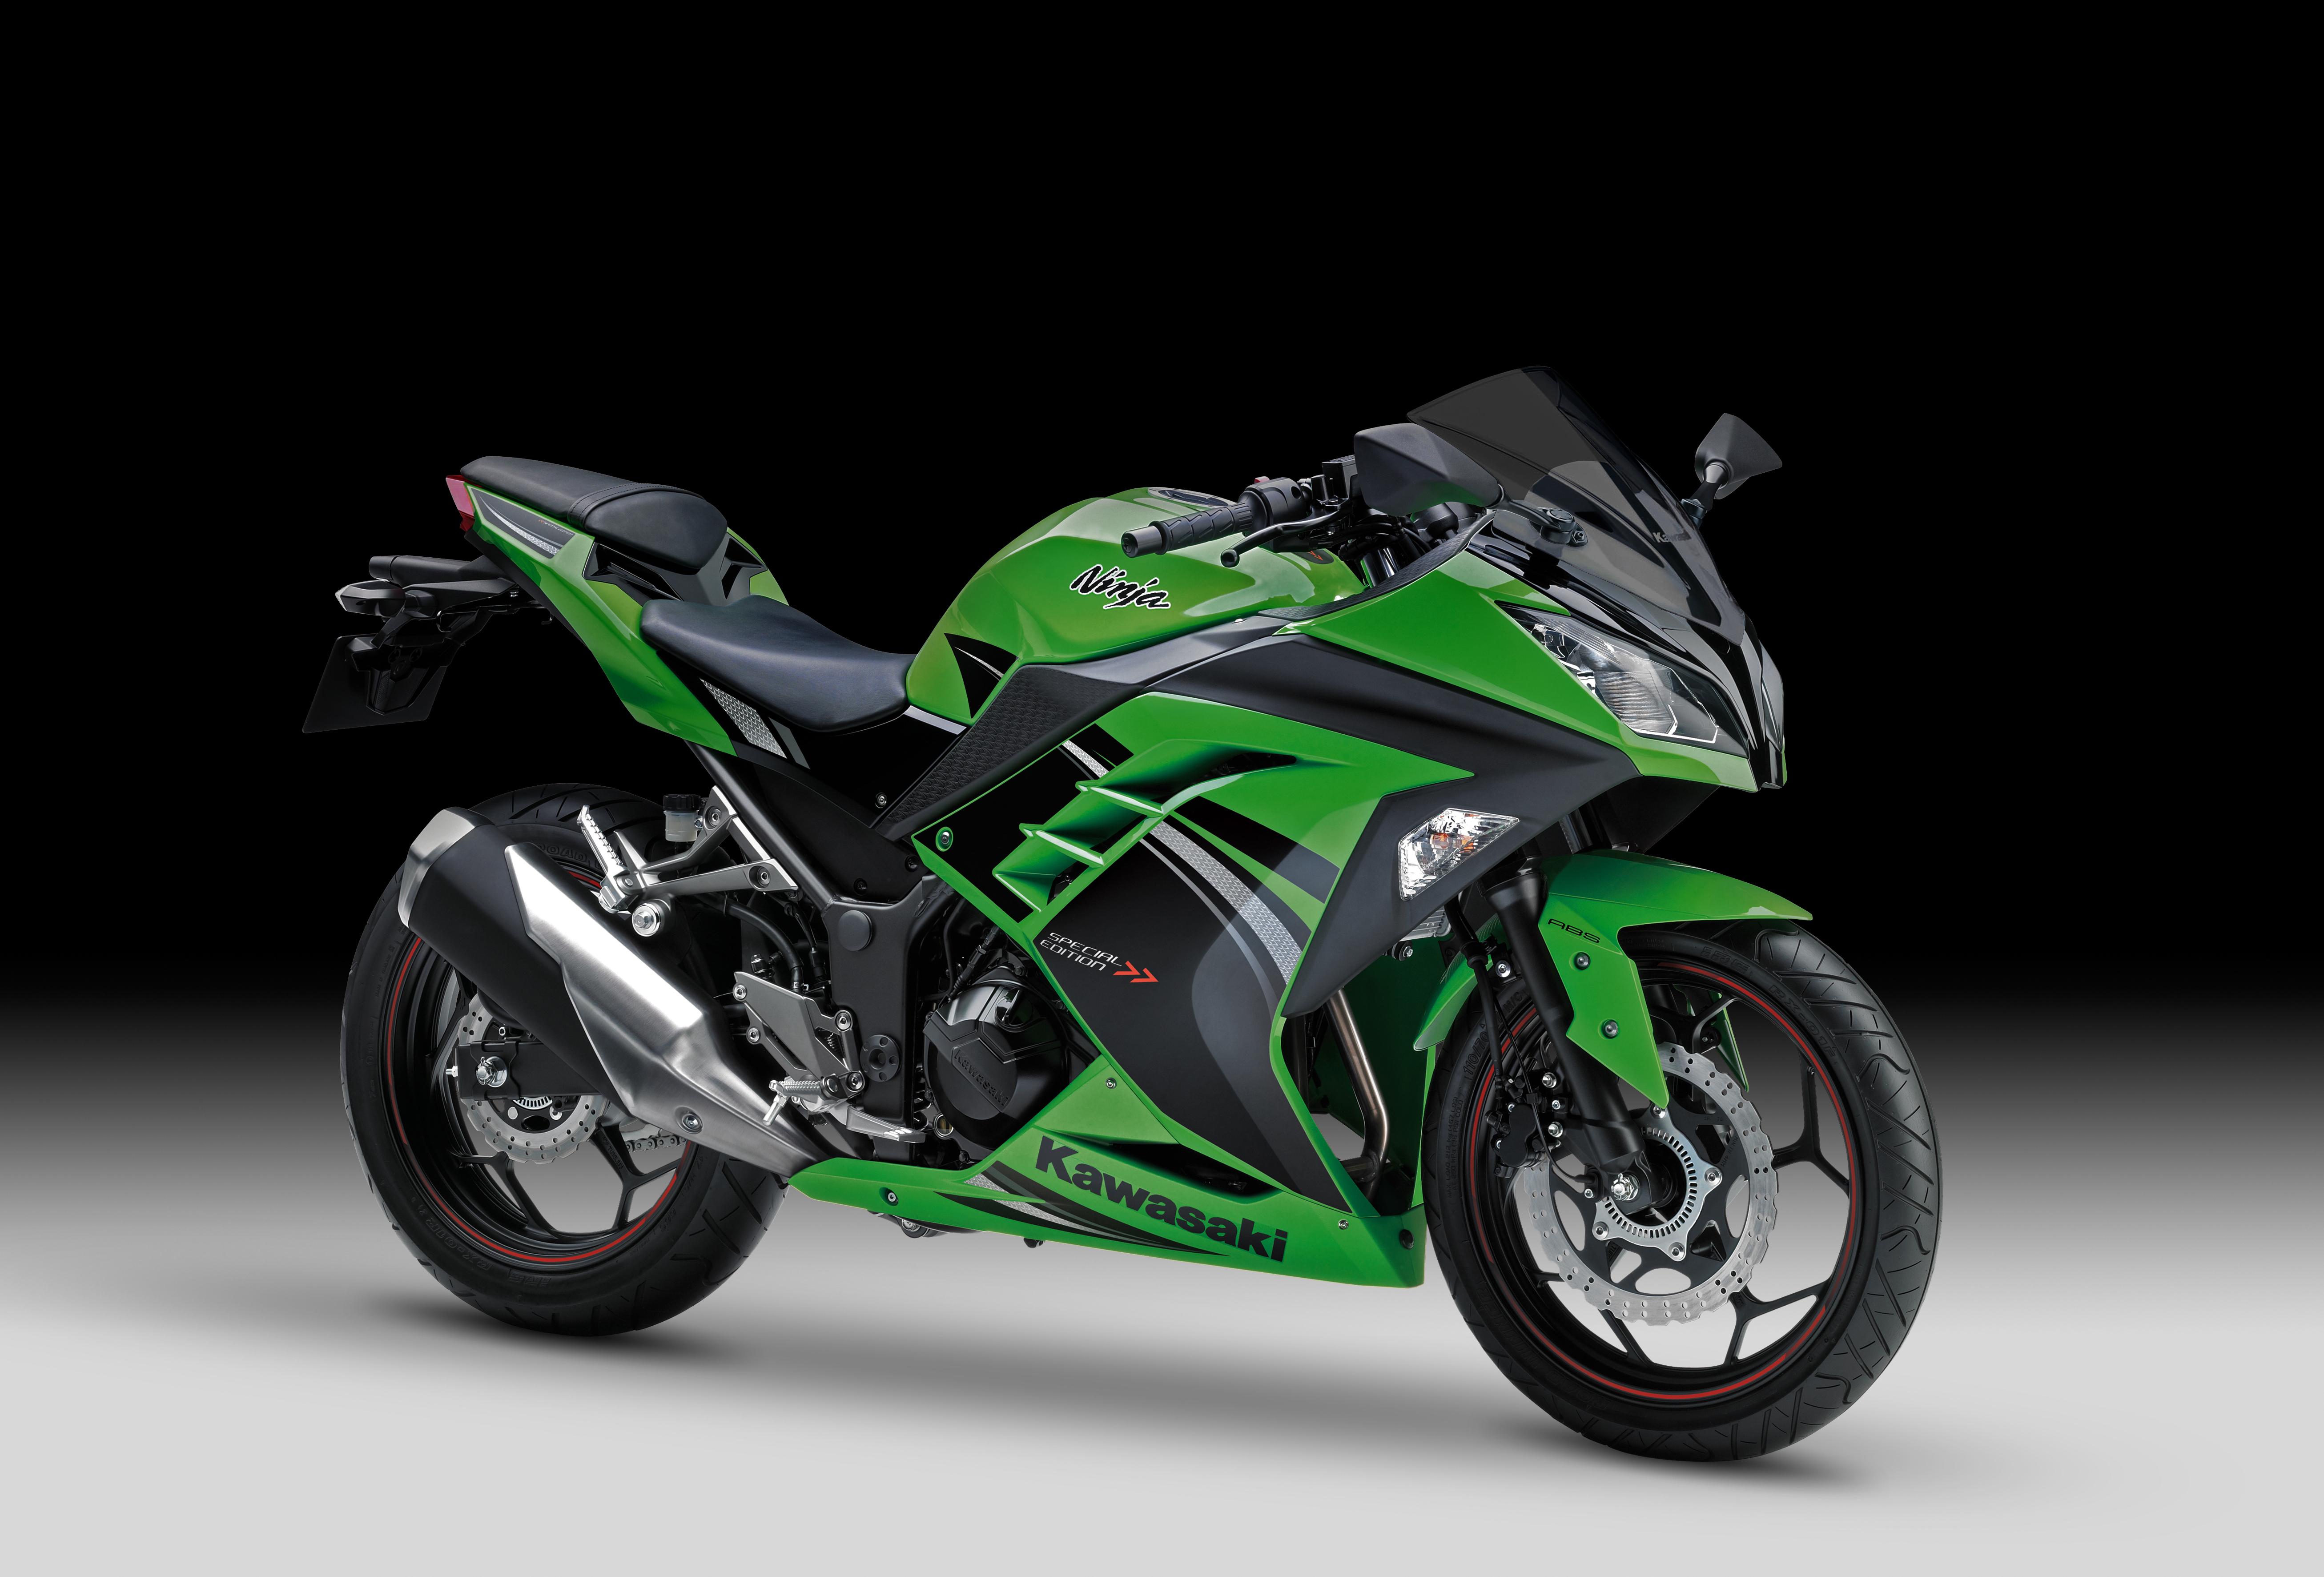 Kawasaki reveals ninja 300 special edition visordown - Ninja 300 forum ...